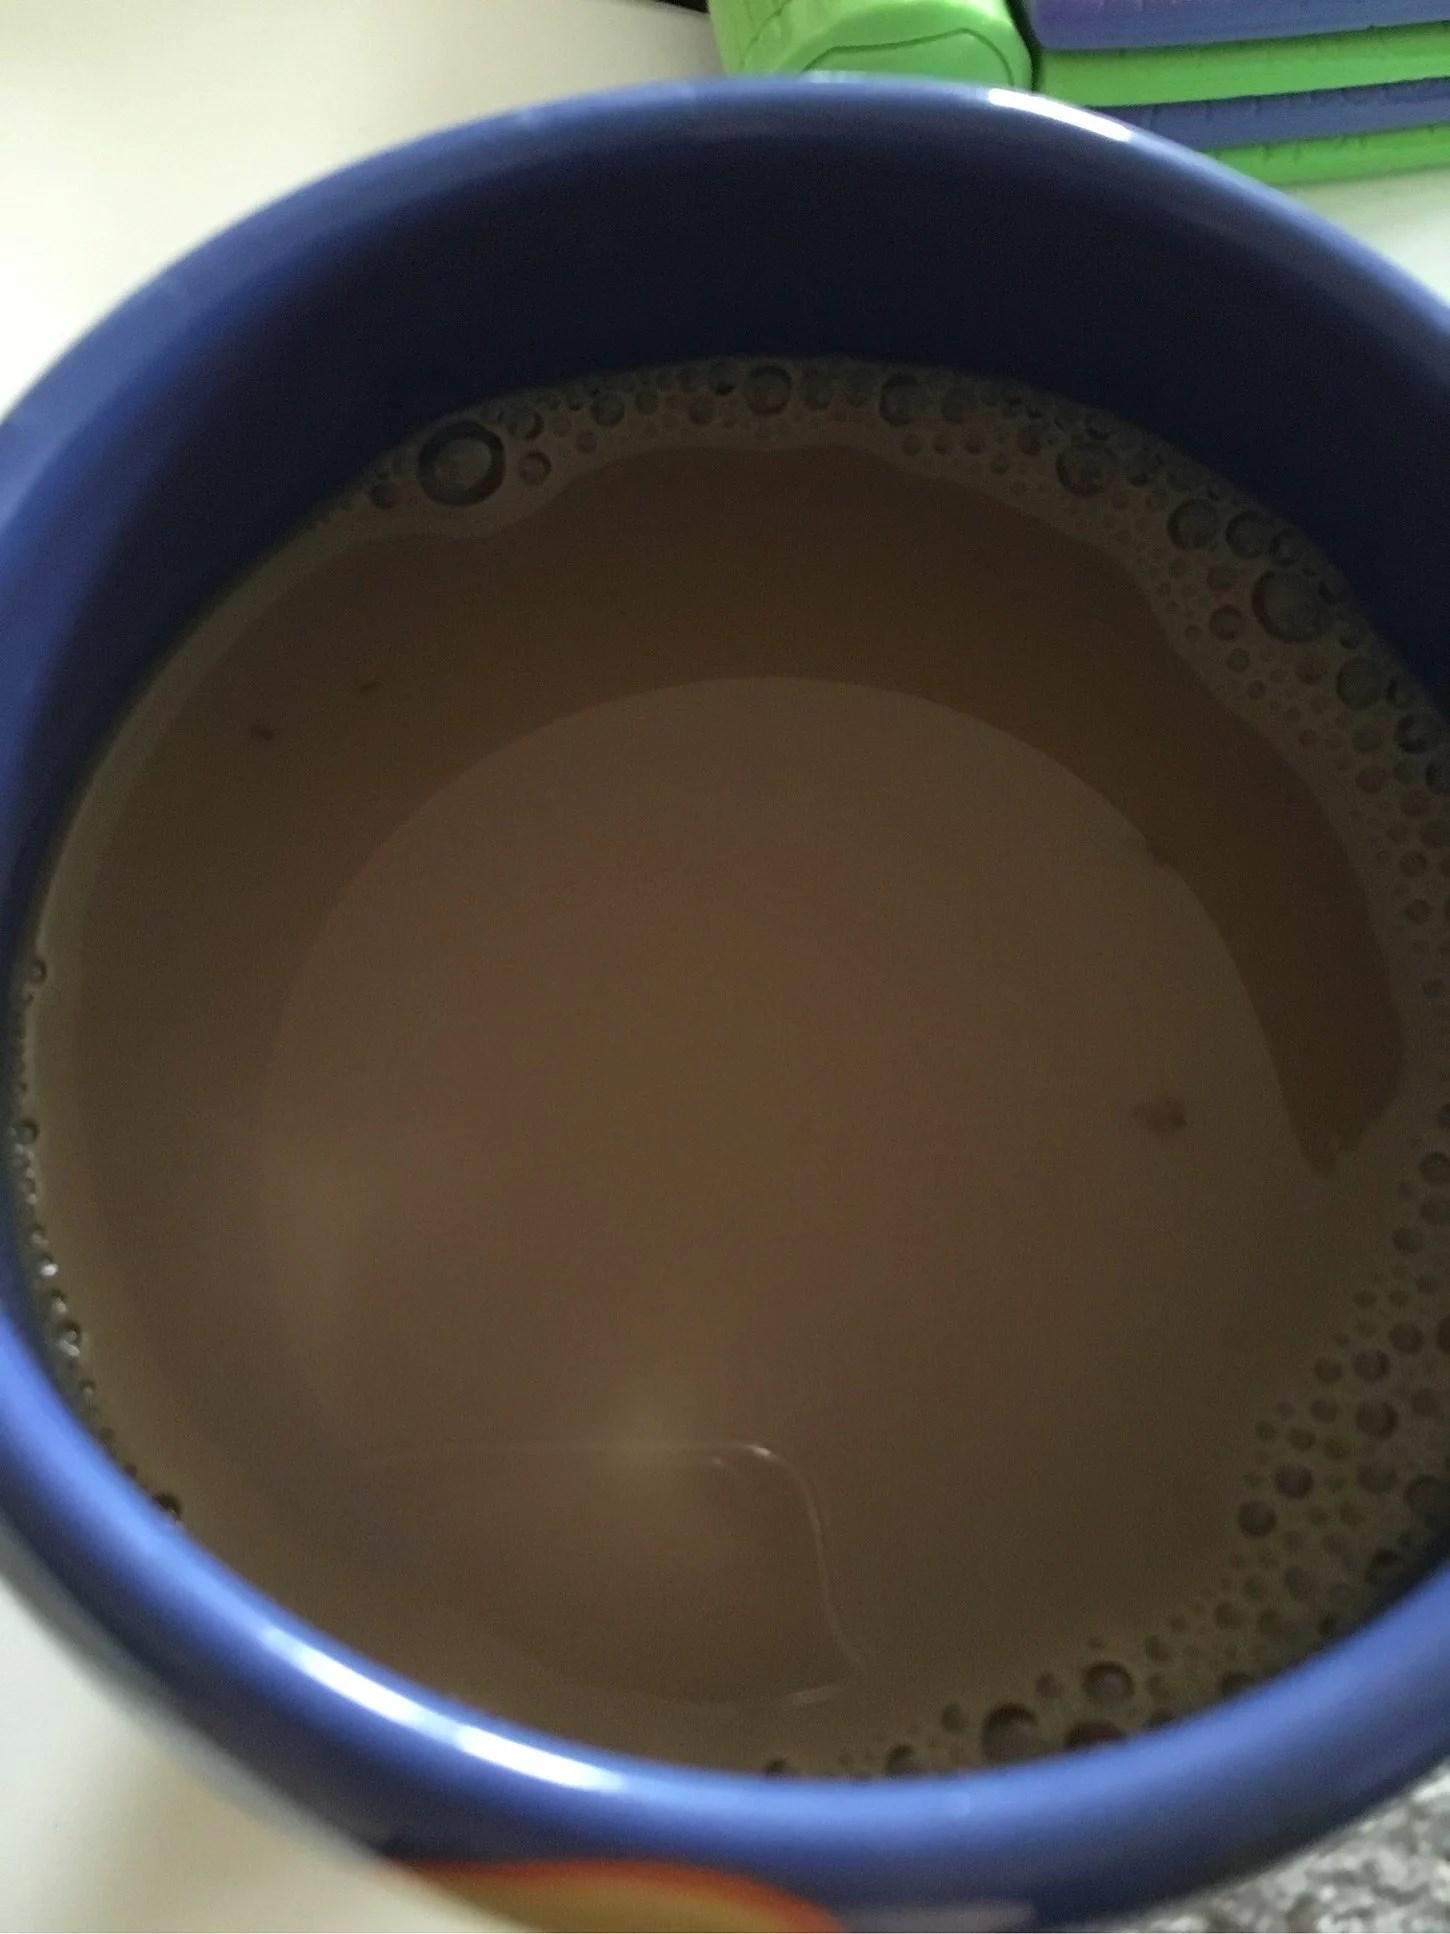 God morgon!